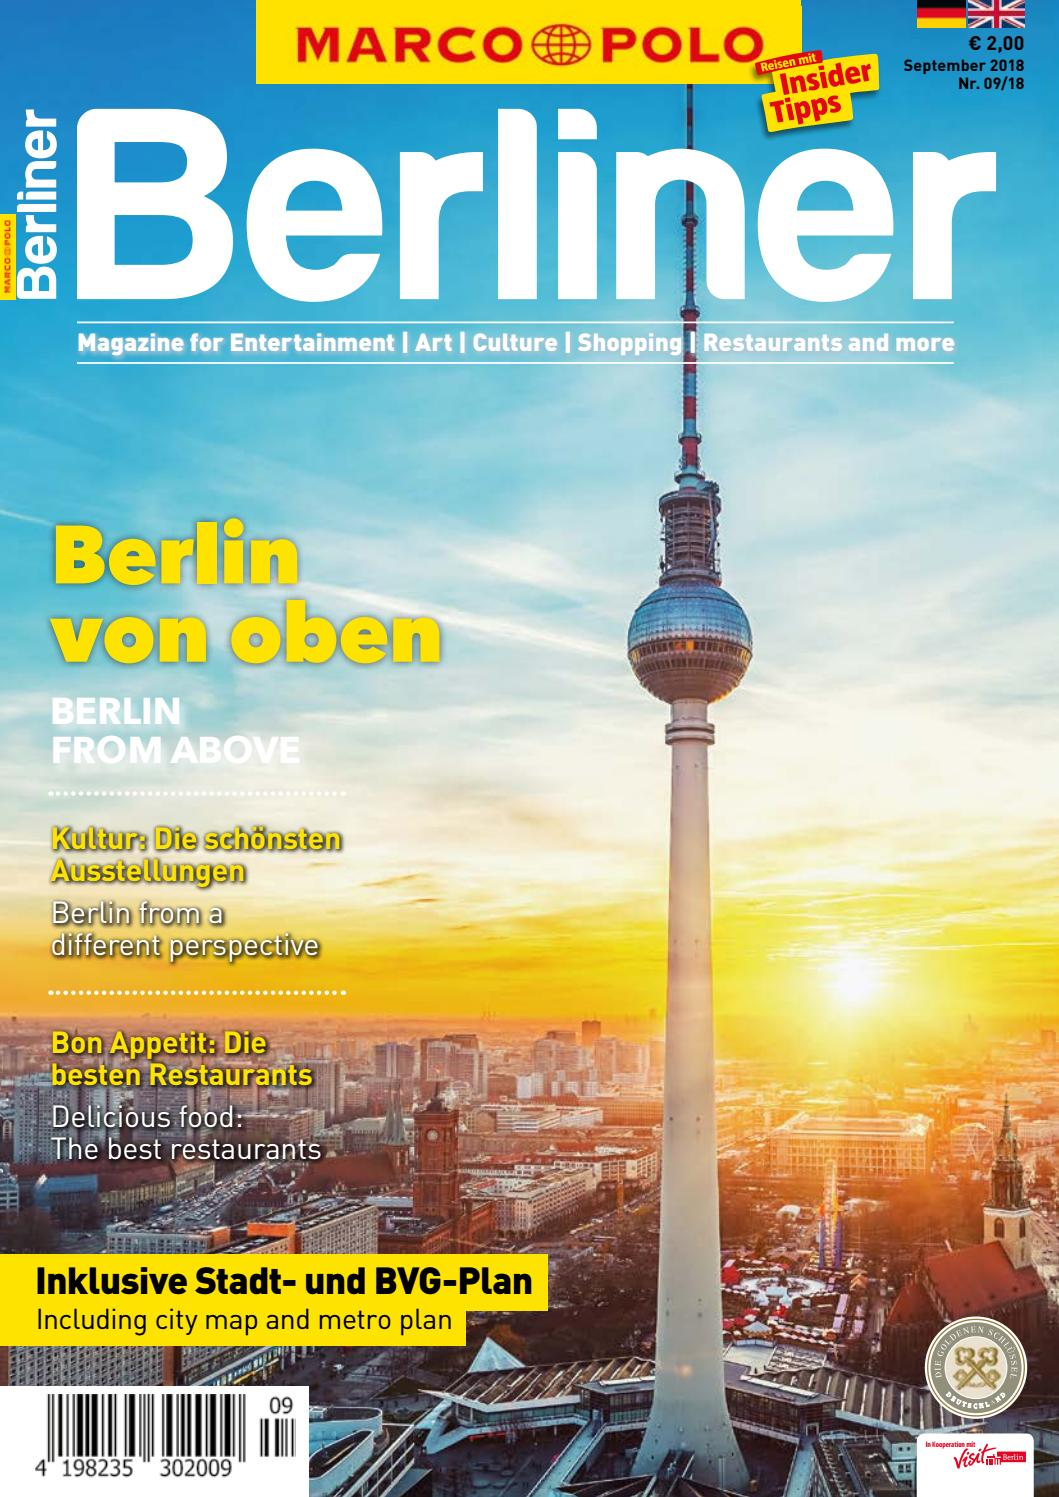 Marco Polo Berliner #0919 by Berlin Medien GmbH - issuu